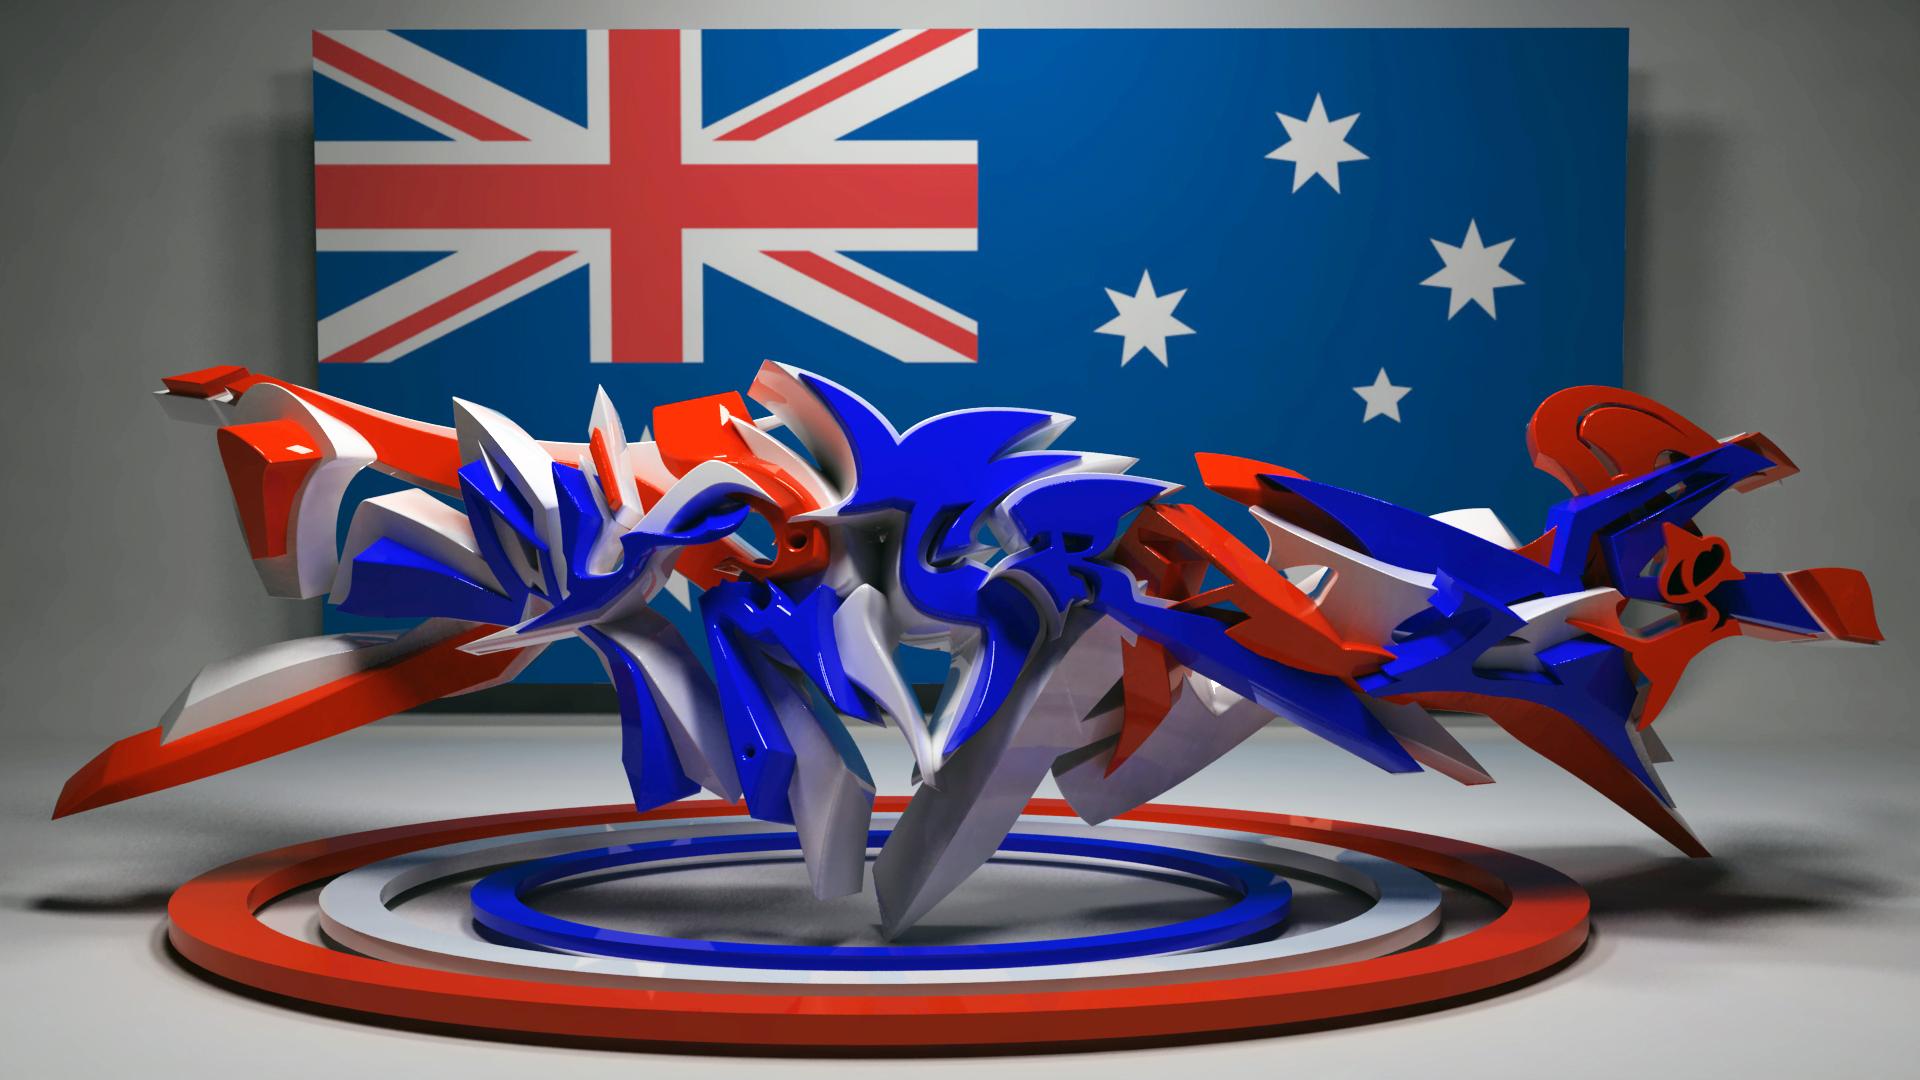 australia graffiti by anhpham88